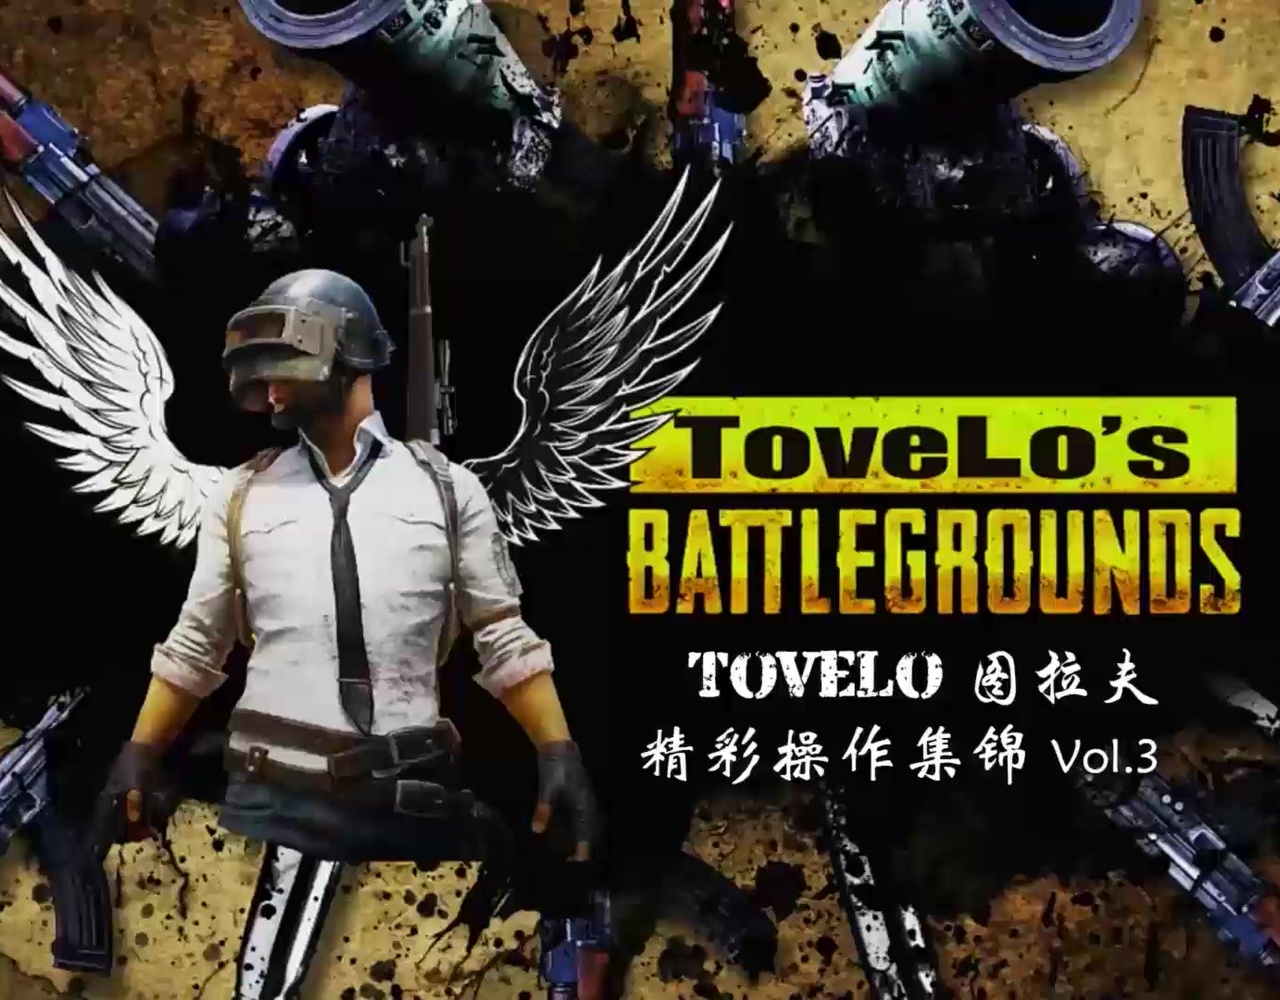 【ToveLo】图拉夫精彩操作集锦 Vol.3